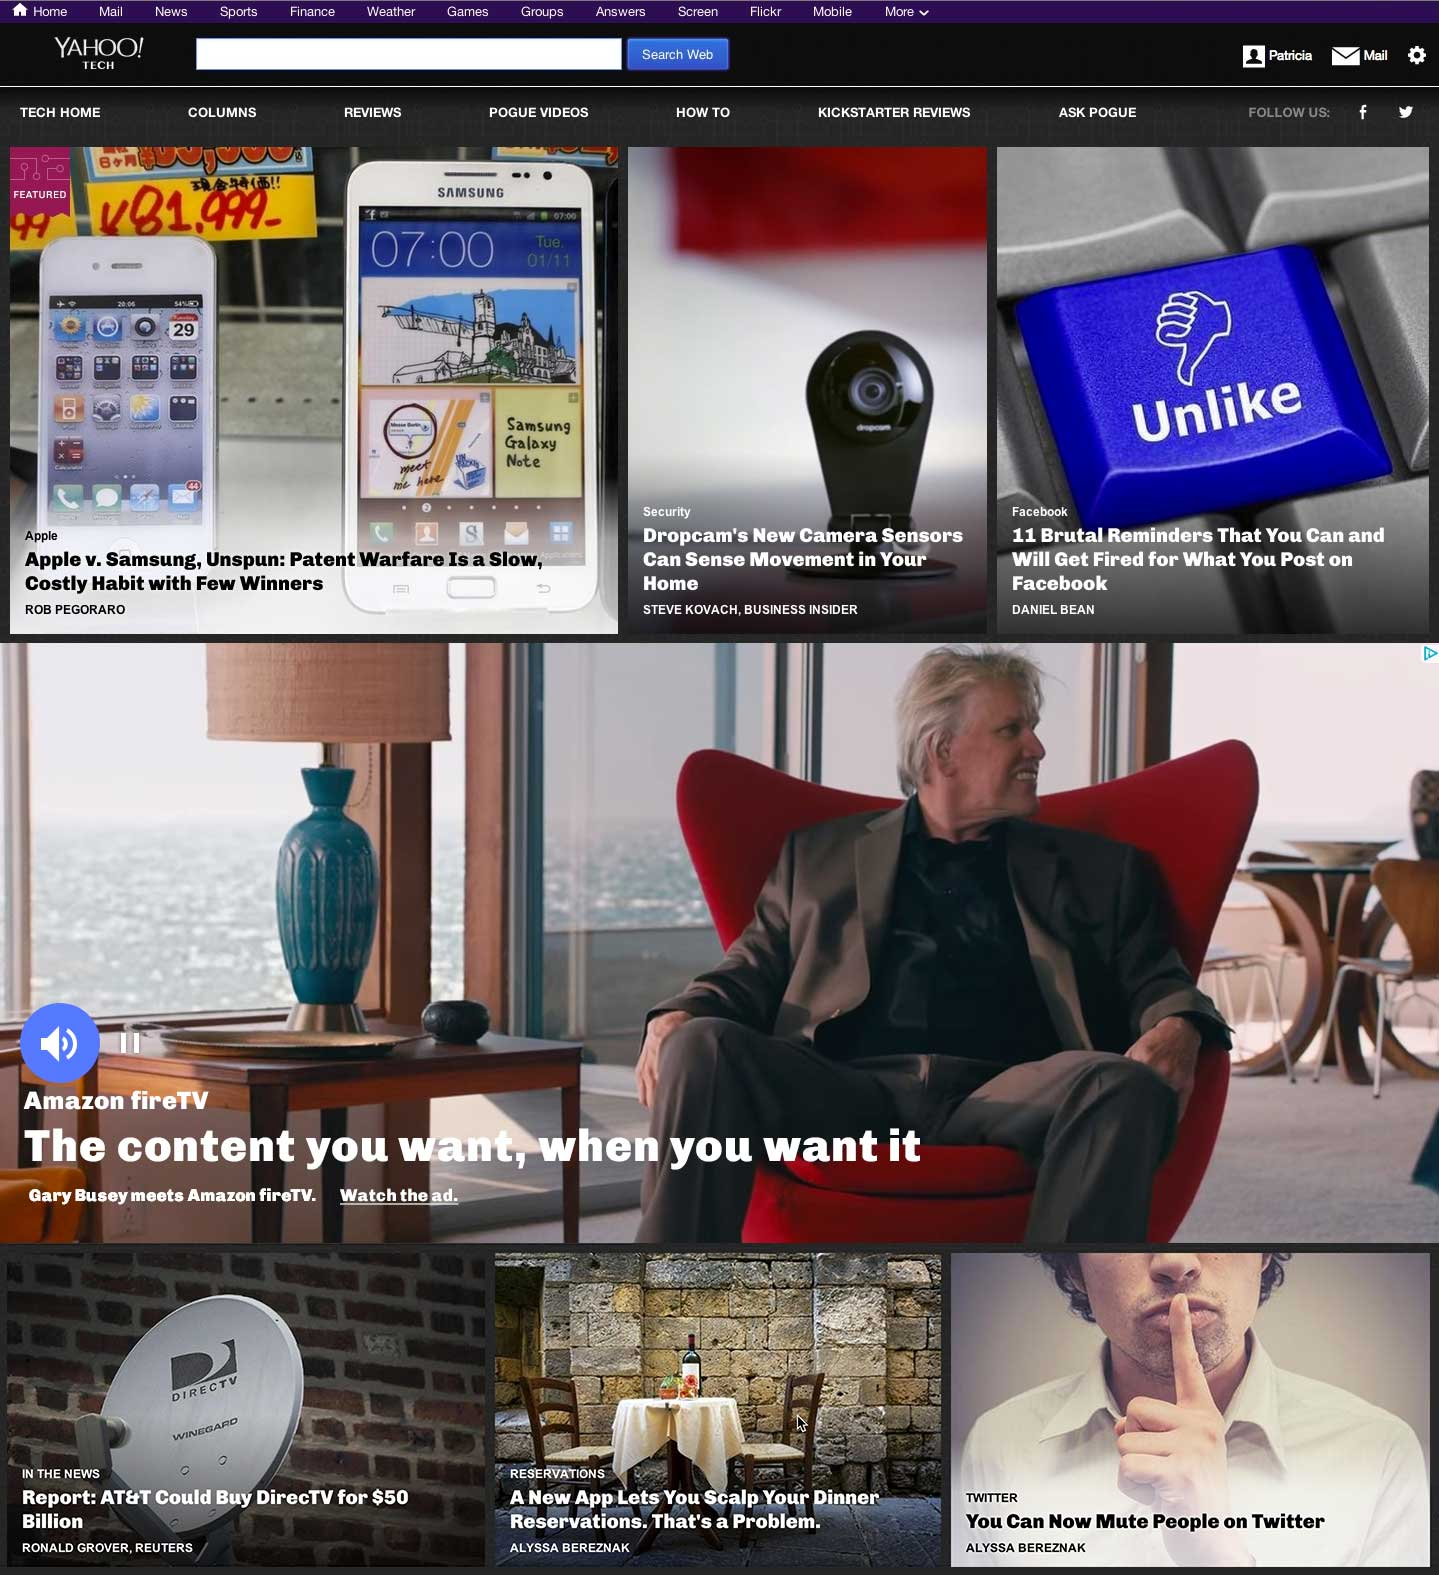 2014_tech_splashad_video-01.jpg